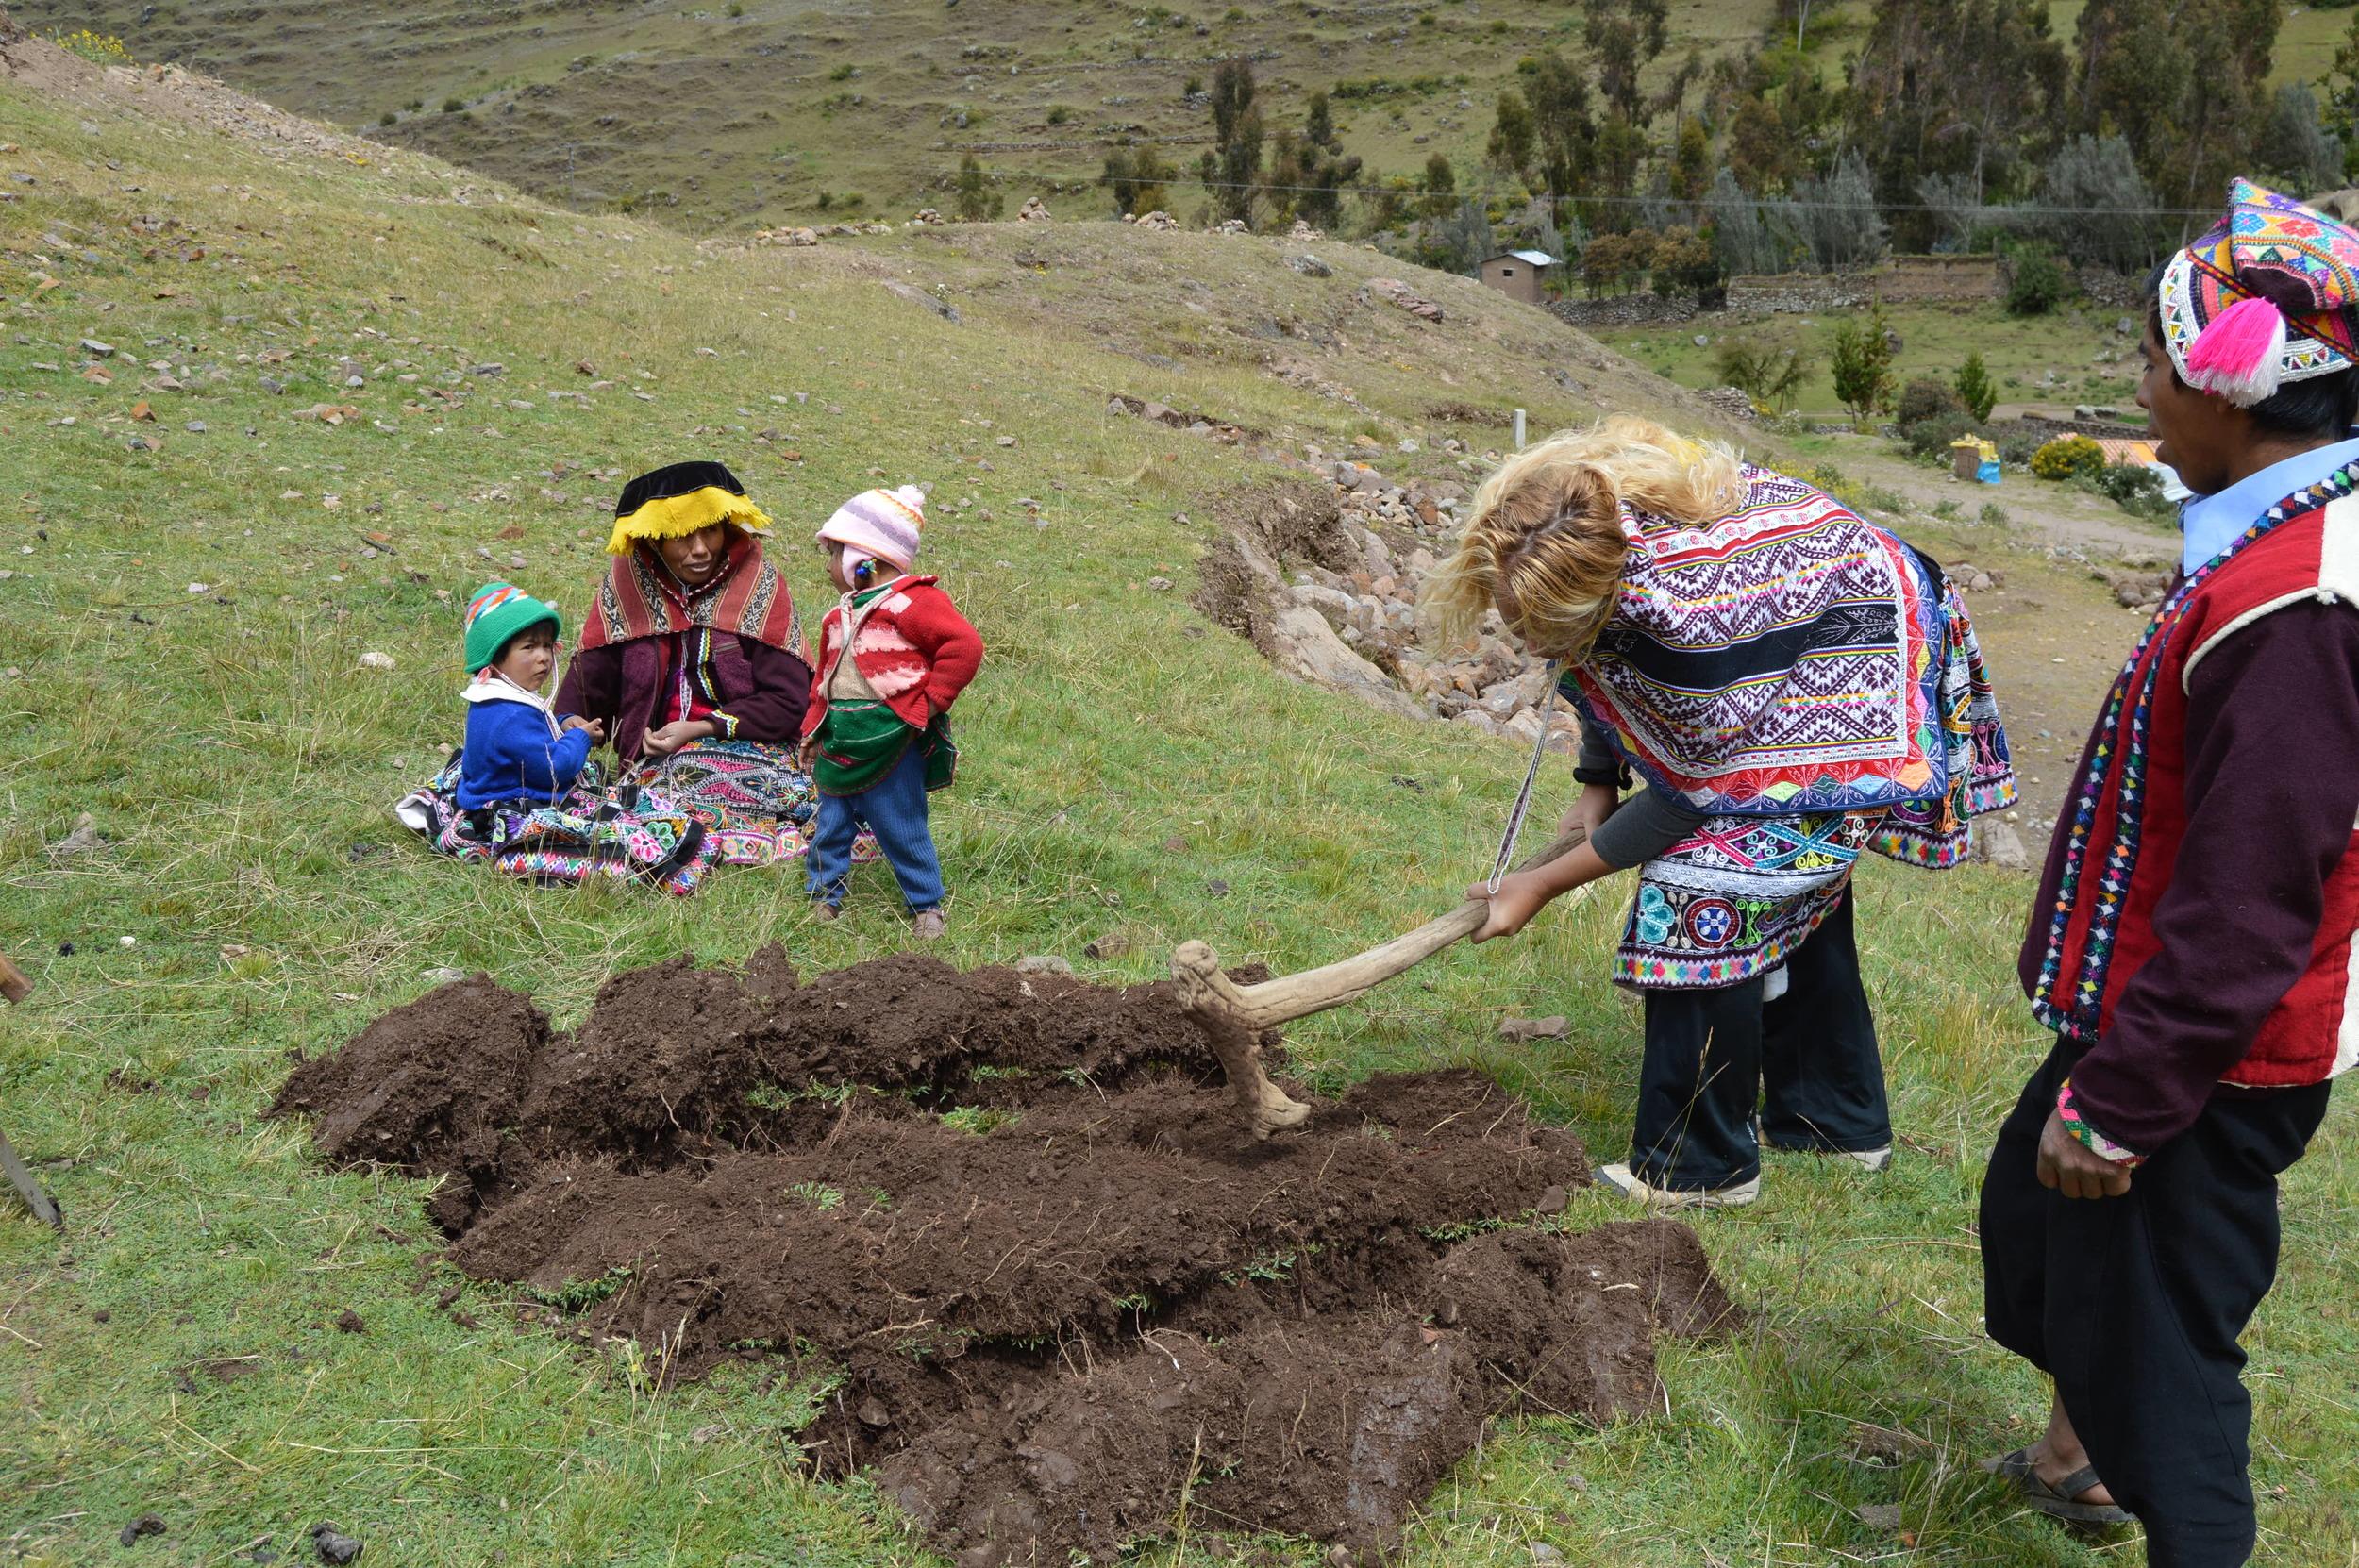 Demonstration of ancestral agricultural techniques at Paru Paru Community near Cusco, Peru